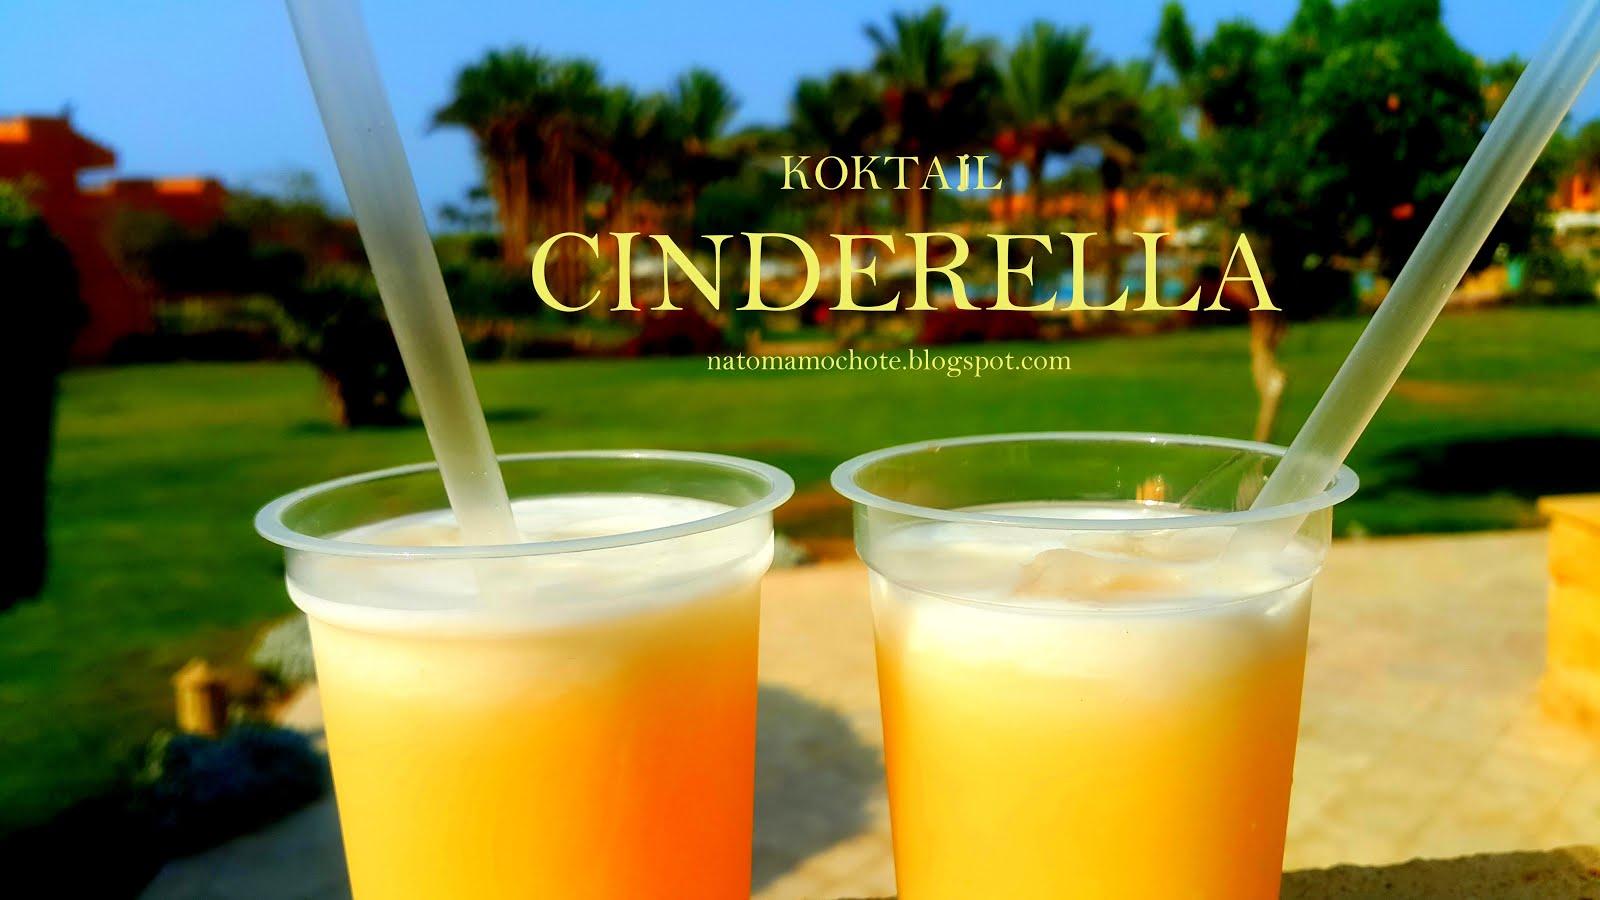 Koktajl Cinderella